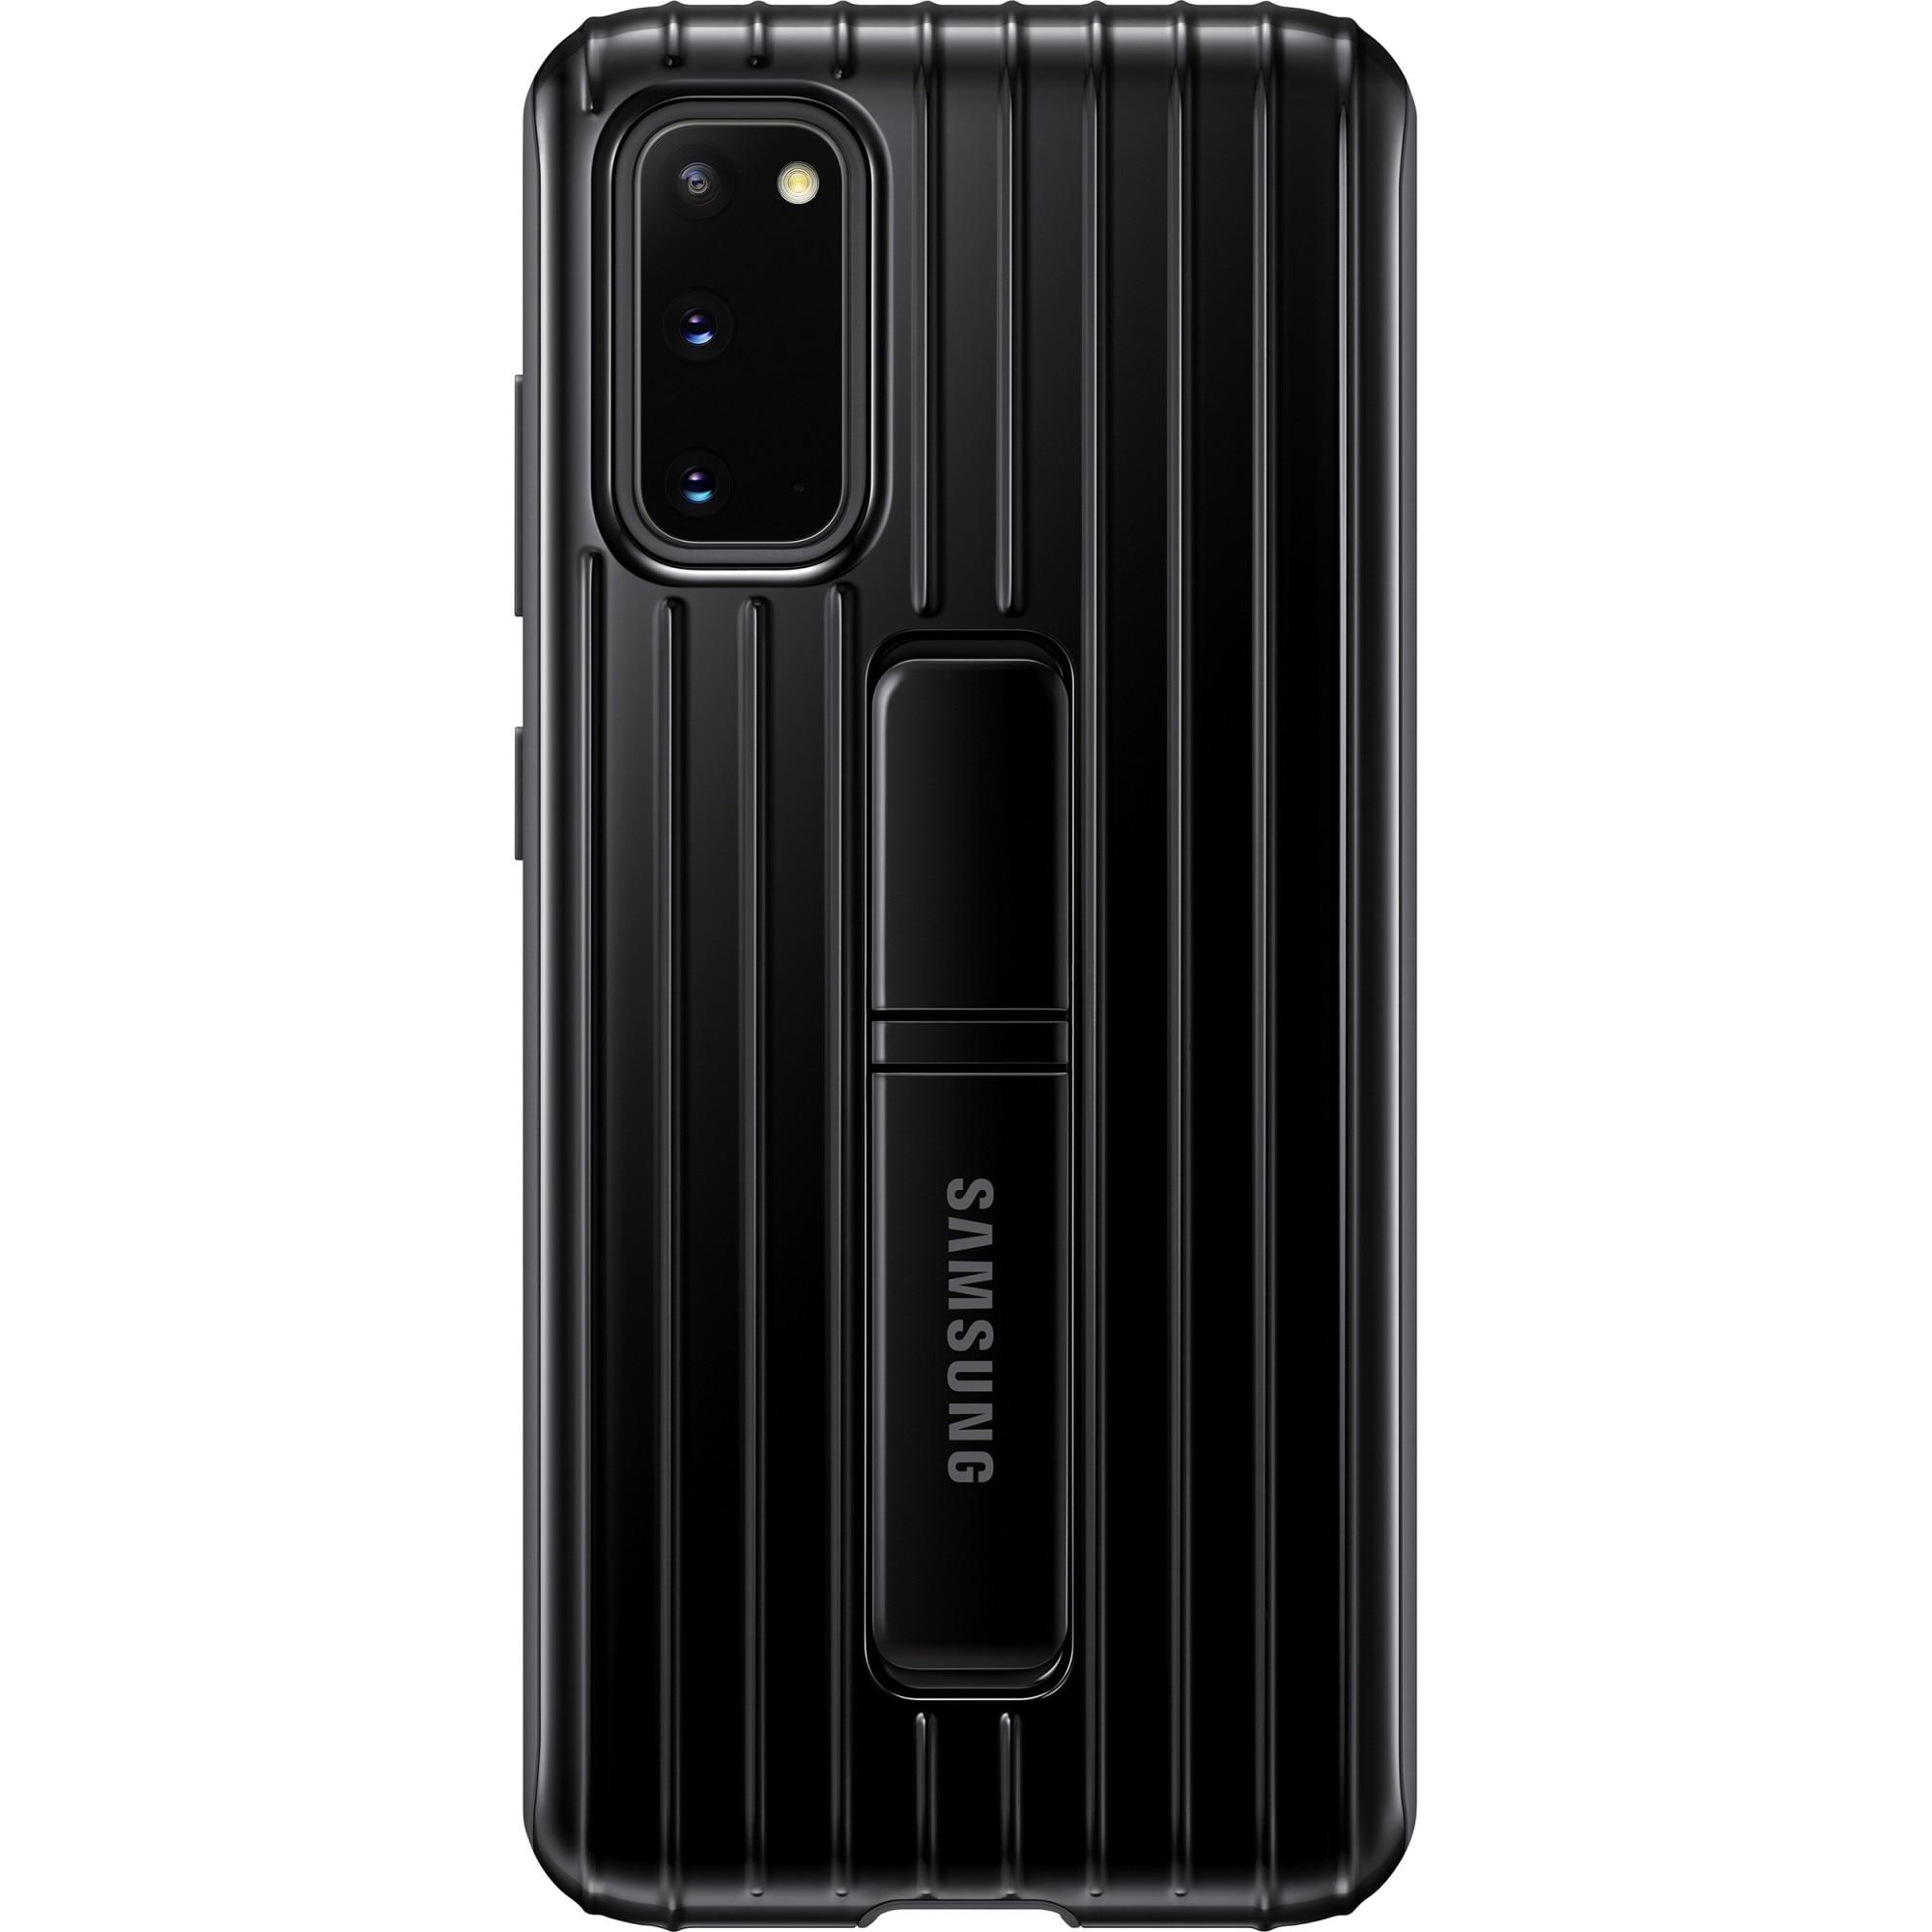 Fotografie Husa de protectie Samsung Protective Standing Cover pentru Galaxy S20, Black